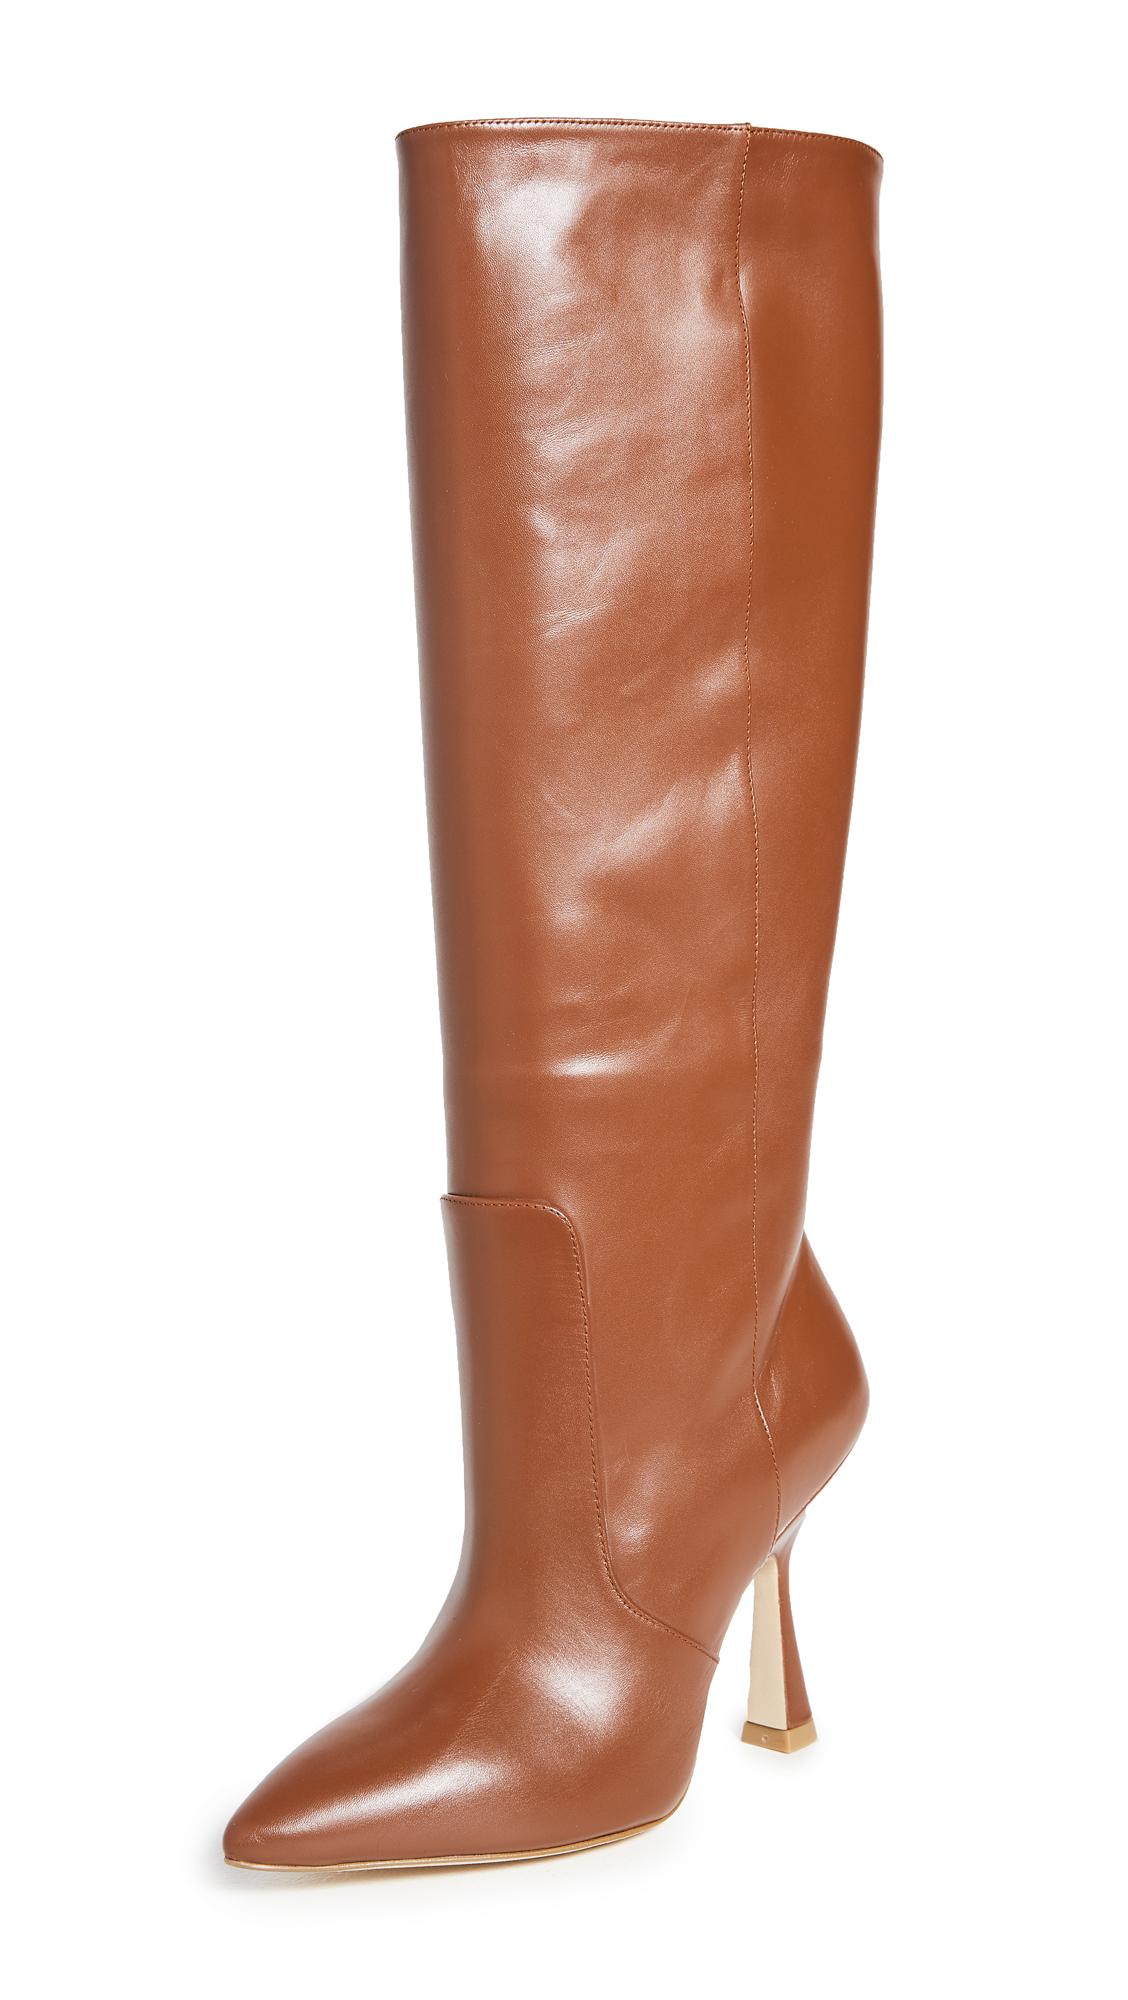 Stuart Weitzman Parton Knee High Boots